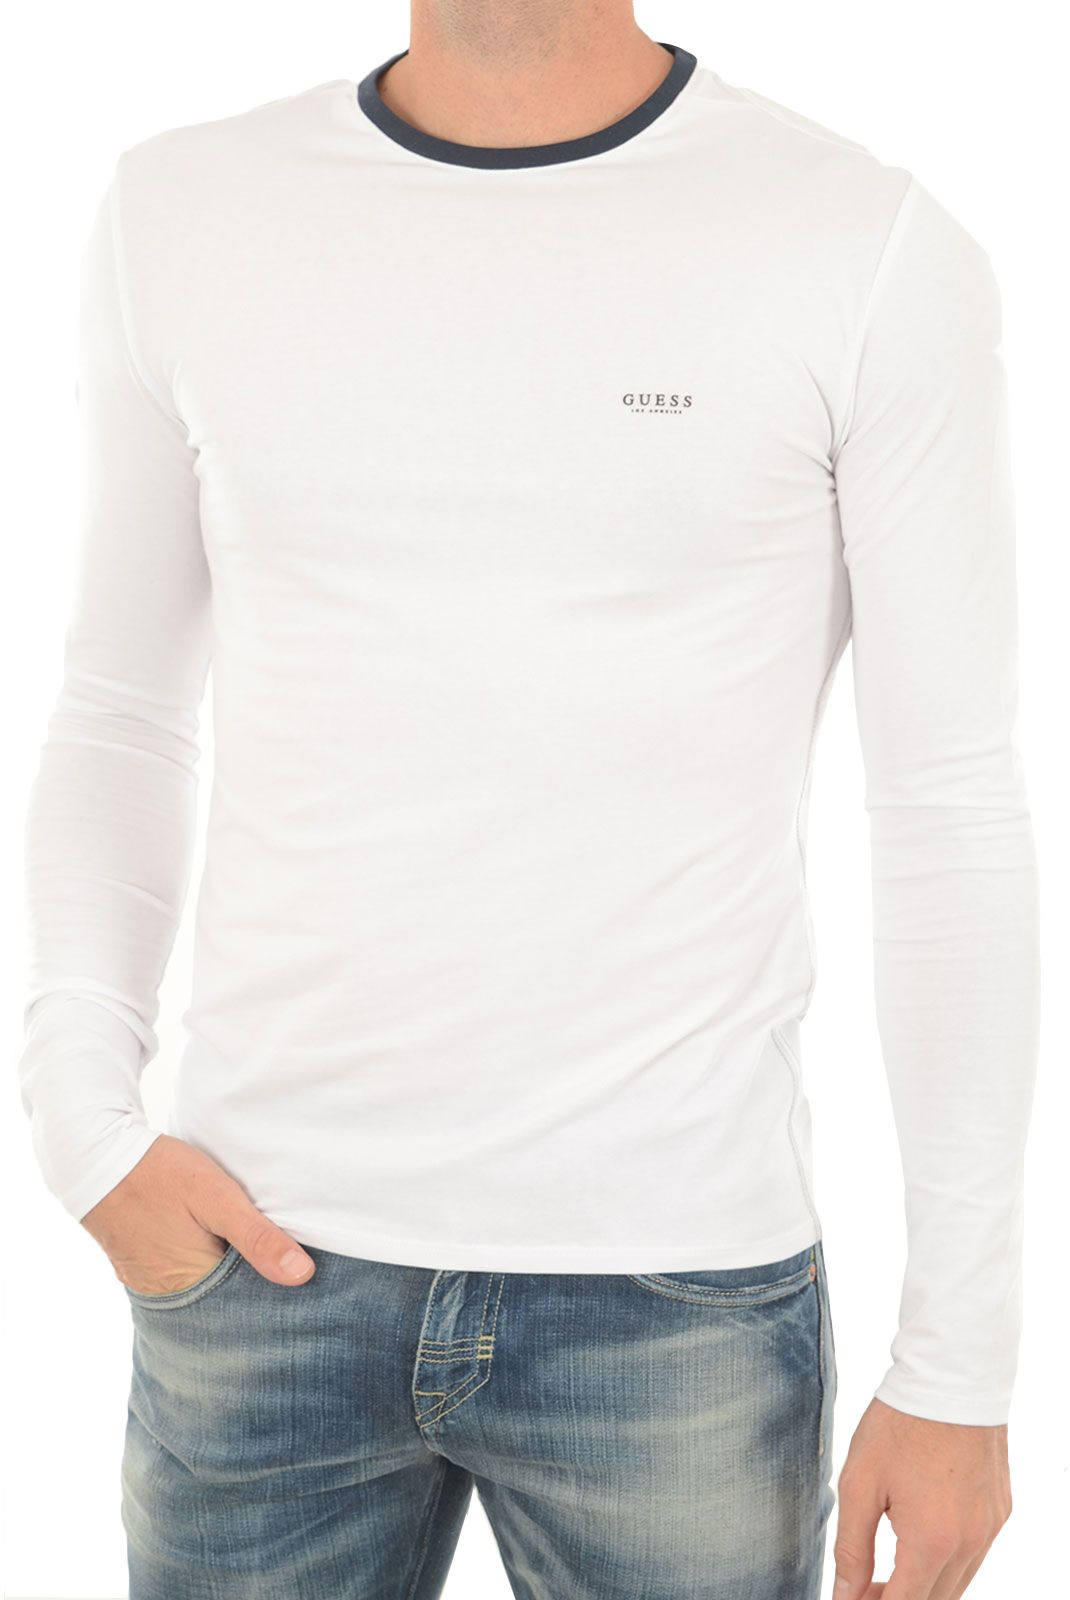 Guess t-shirt m74i72 blanc manches longues